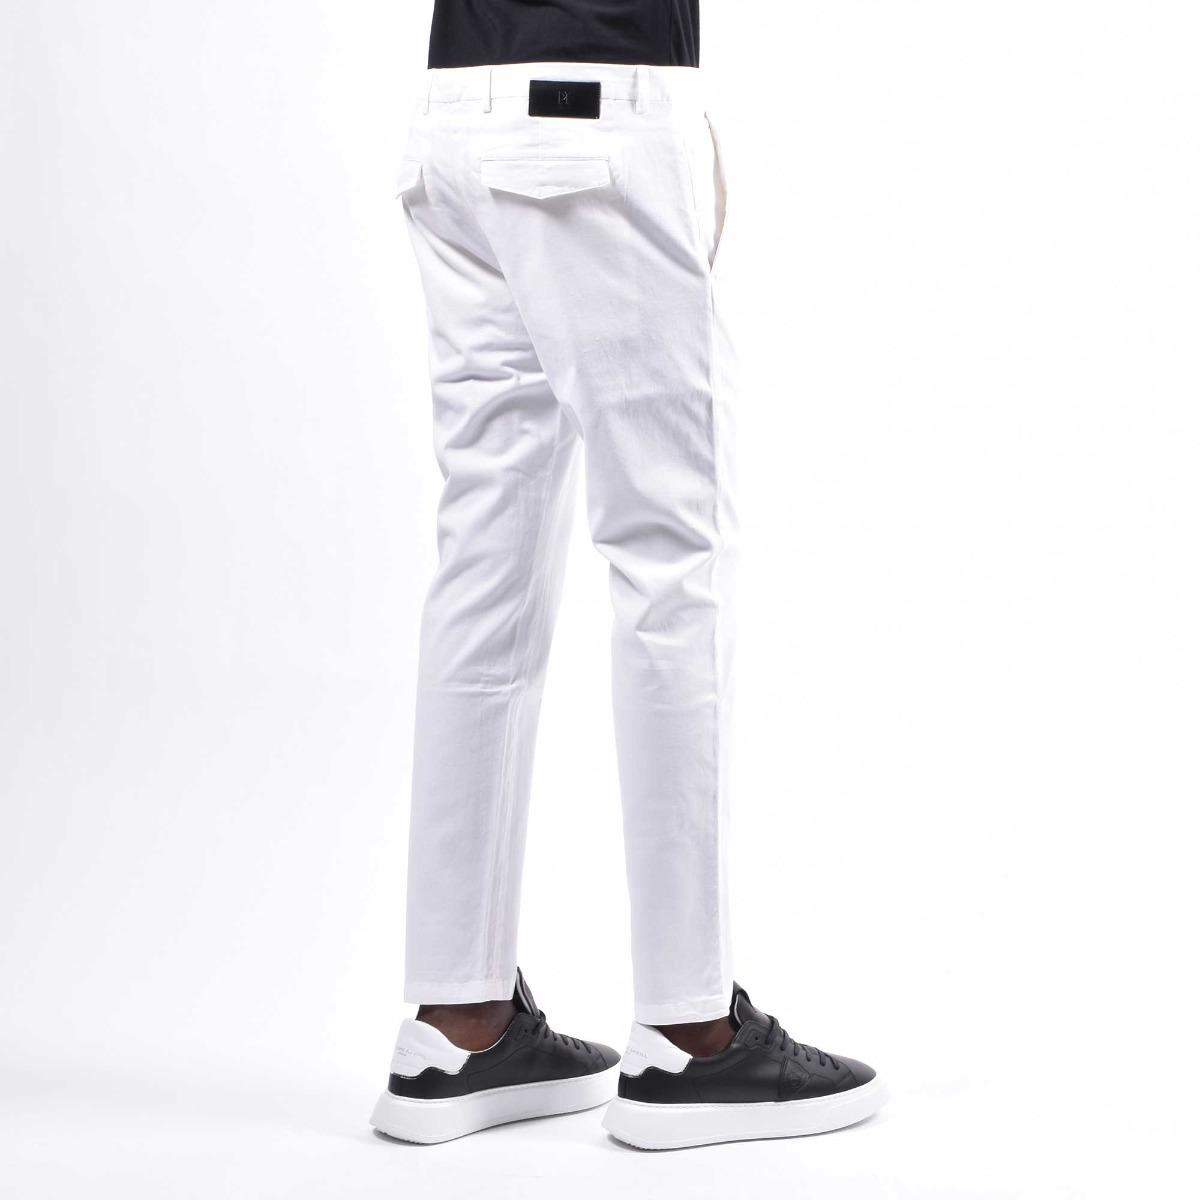 Pantalone tasca america pt - Bianco